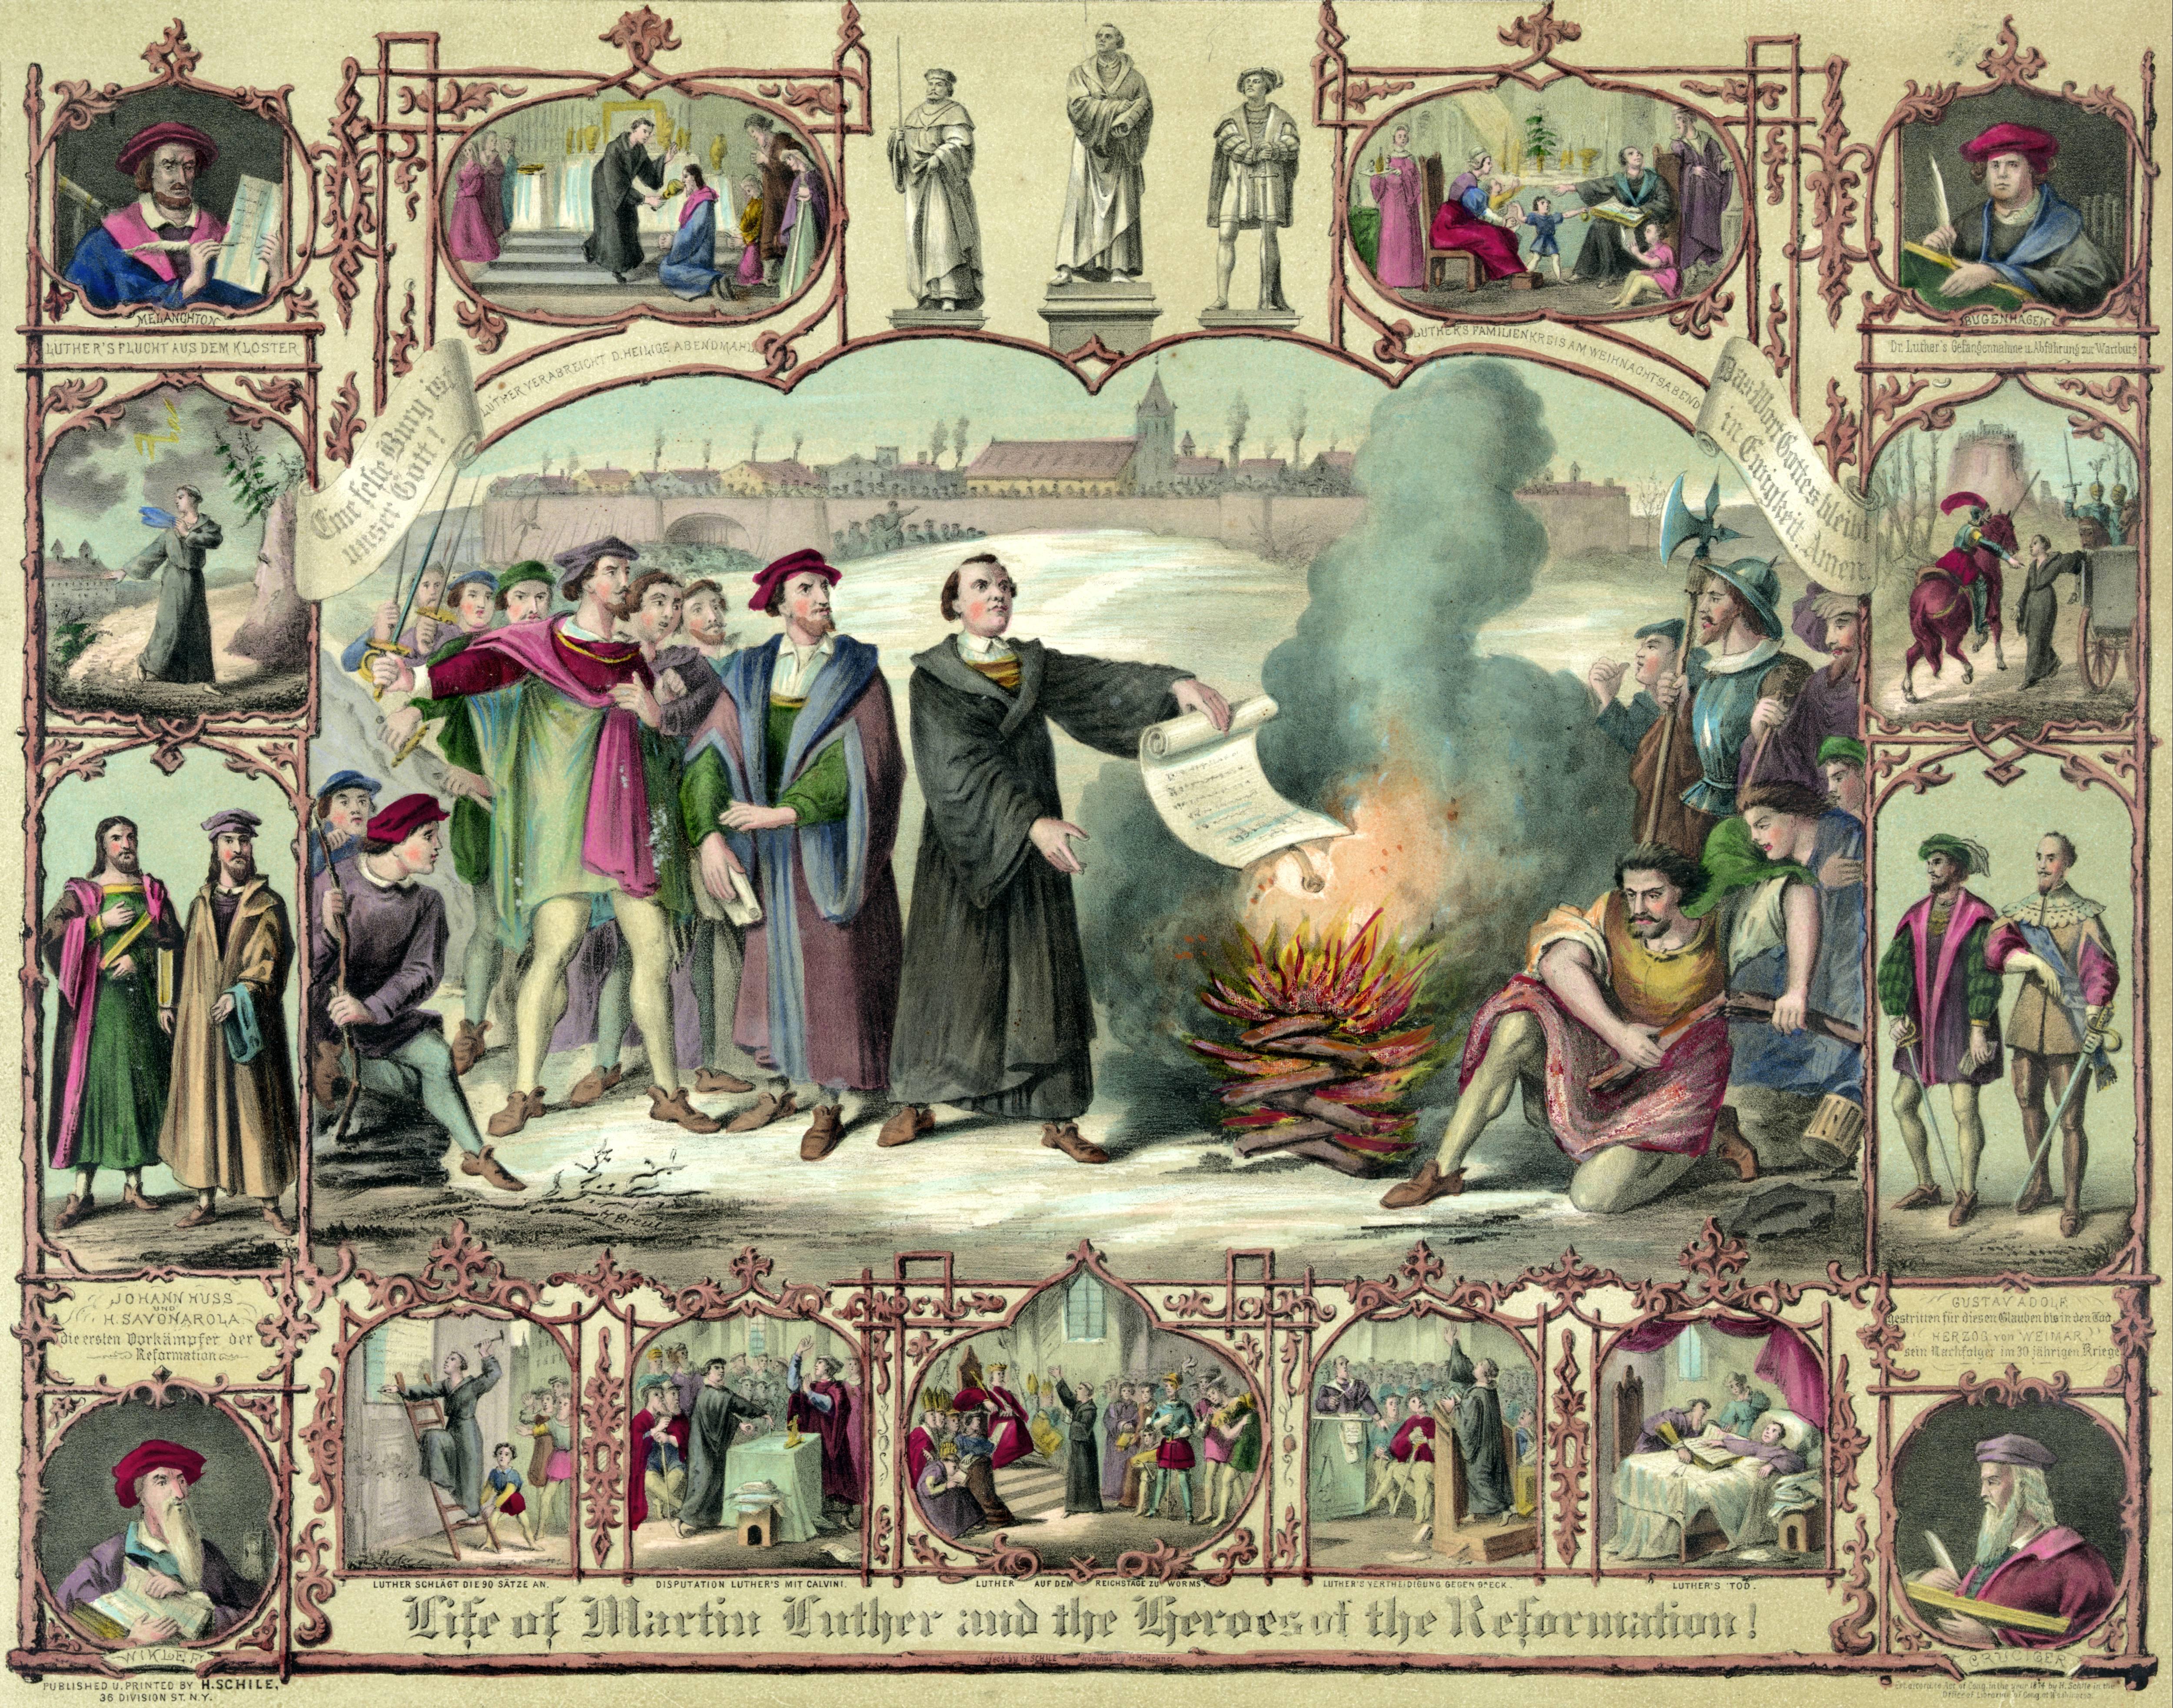 Renaissance vs reformation